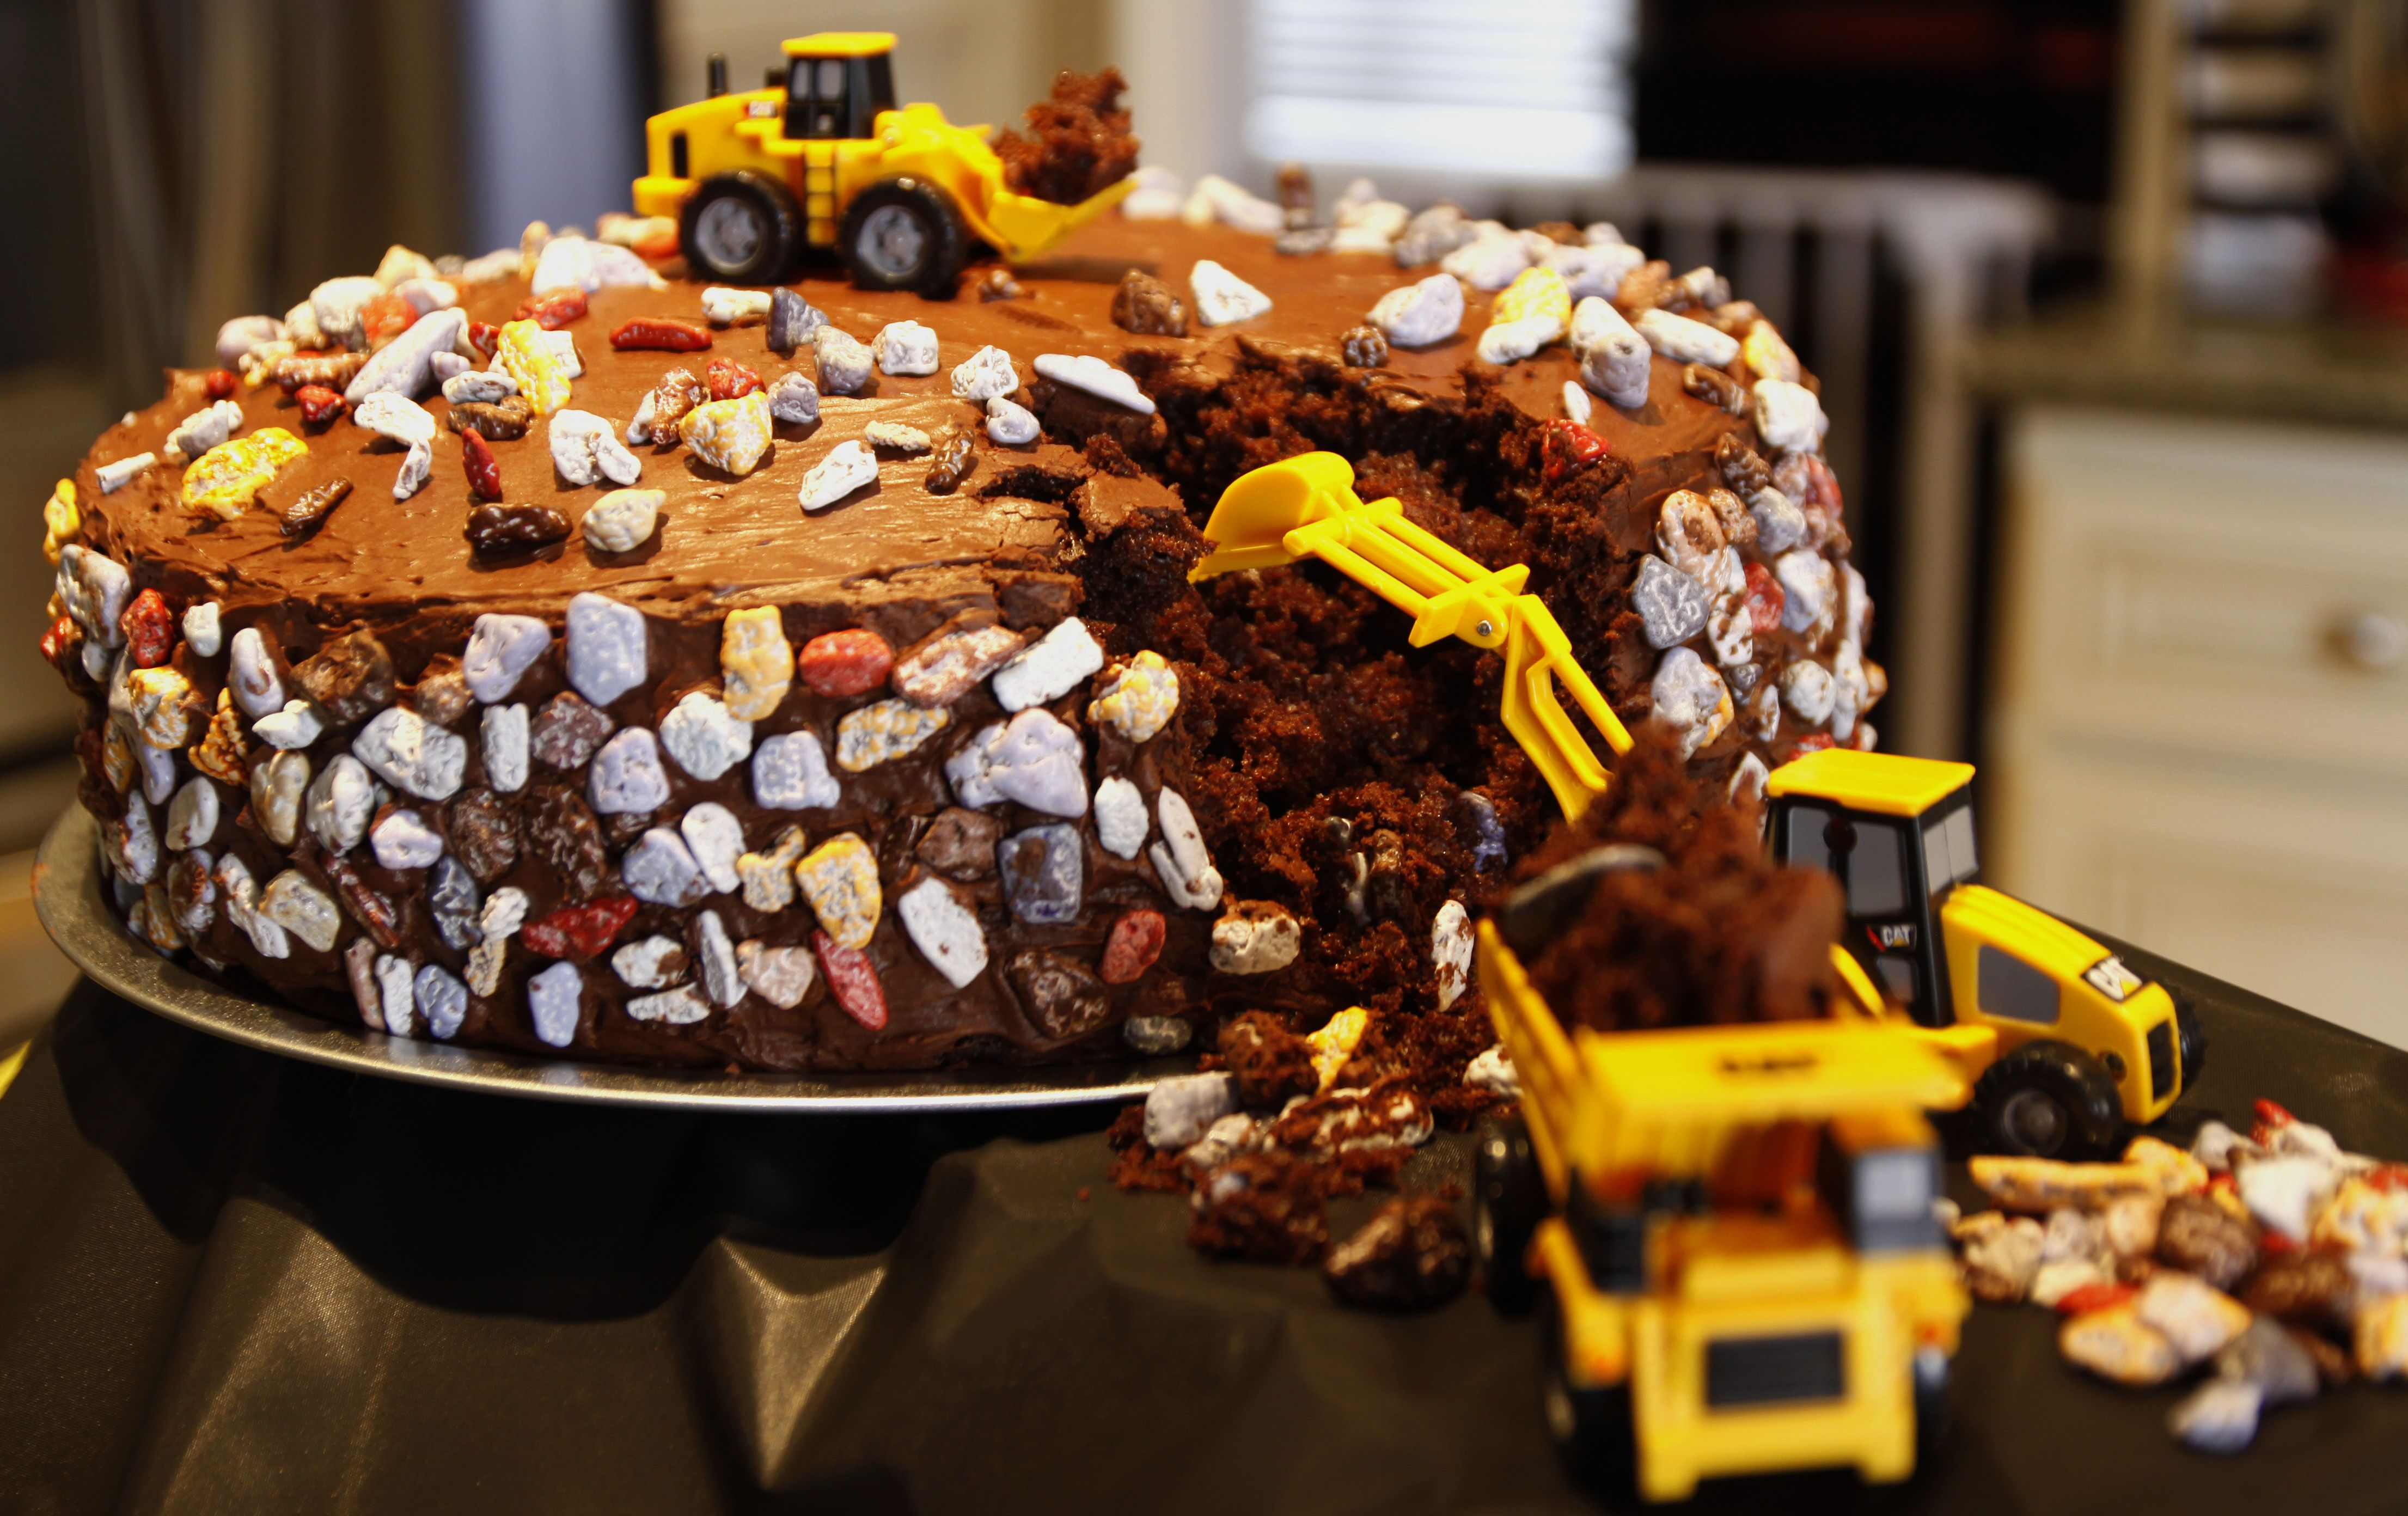 CONSTRUCTION THEME CAKE...by LAUREN FONTANA